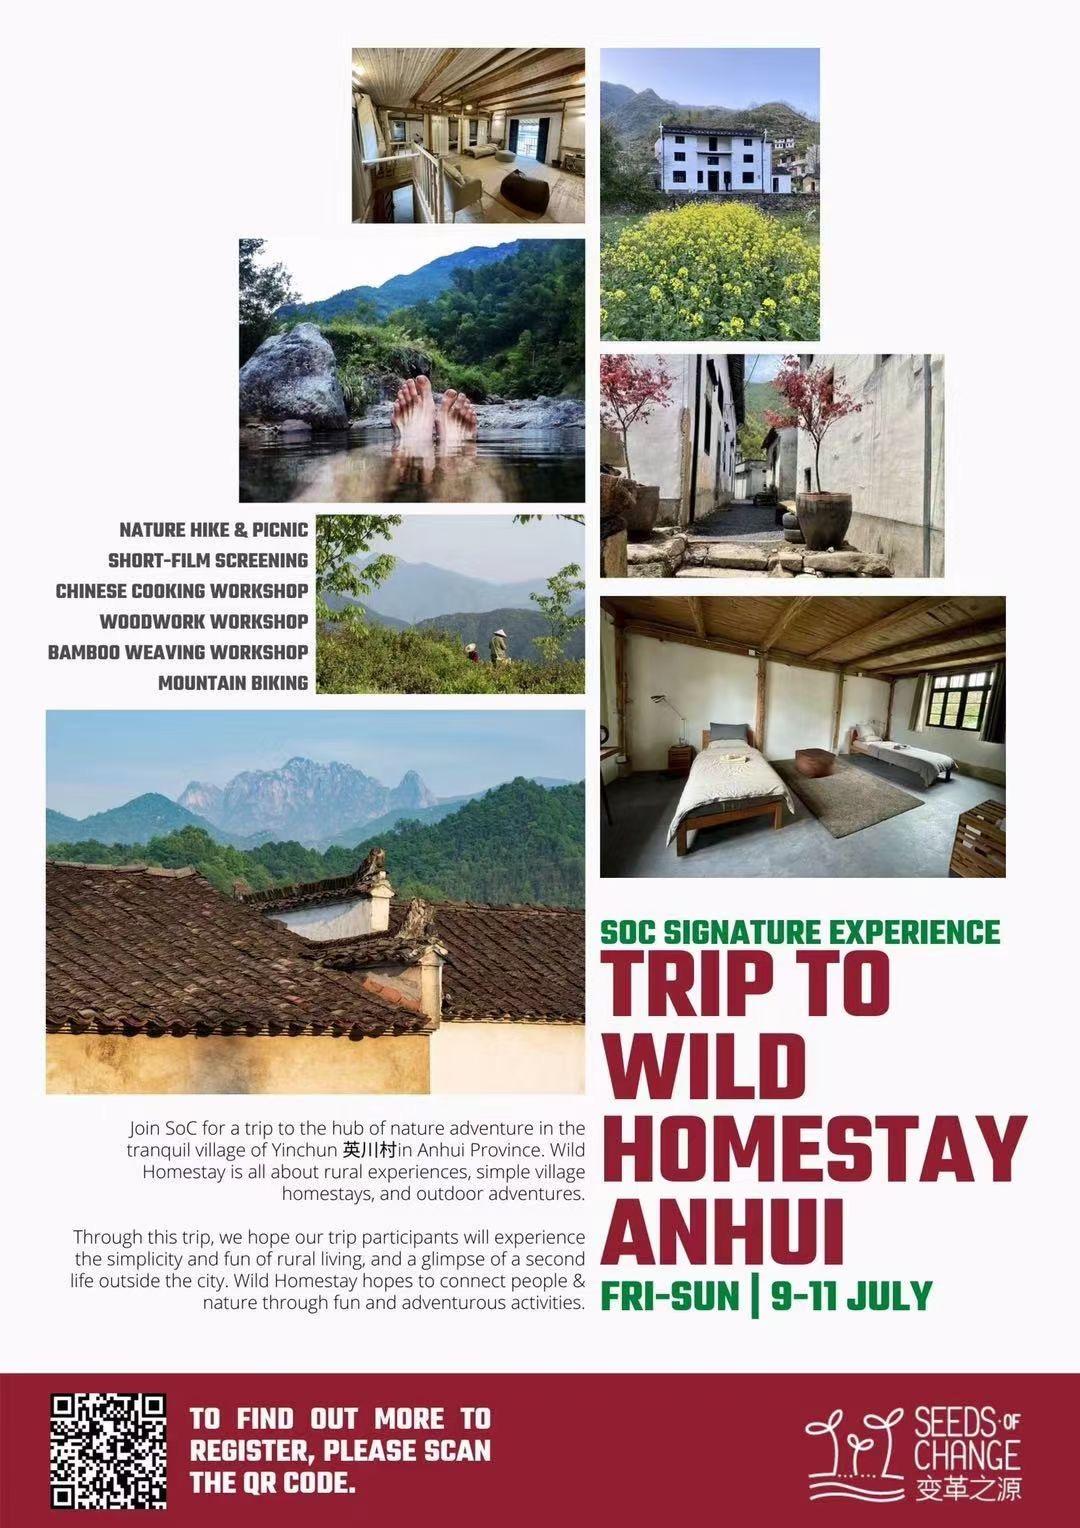 Trip to wild homestay anhui